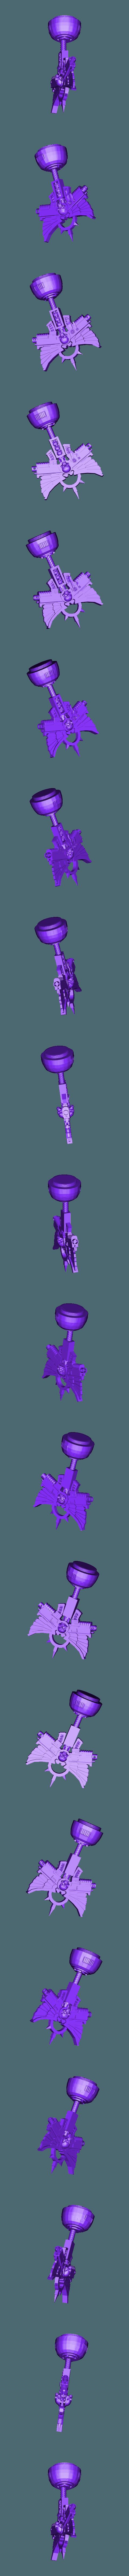 Crozius_L.stl Download free STL file Ultra Inquisitive and Super Pious Mega (and Slightly Insecure) Arachnid • 3D printer design, bentanweihao